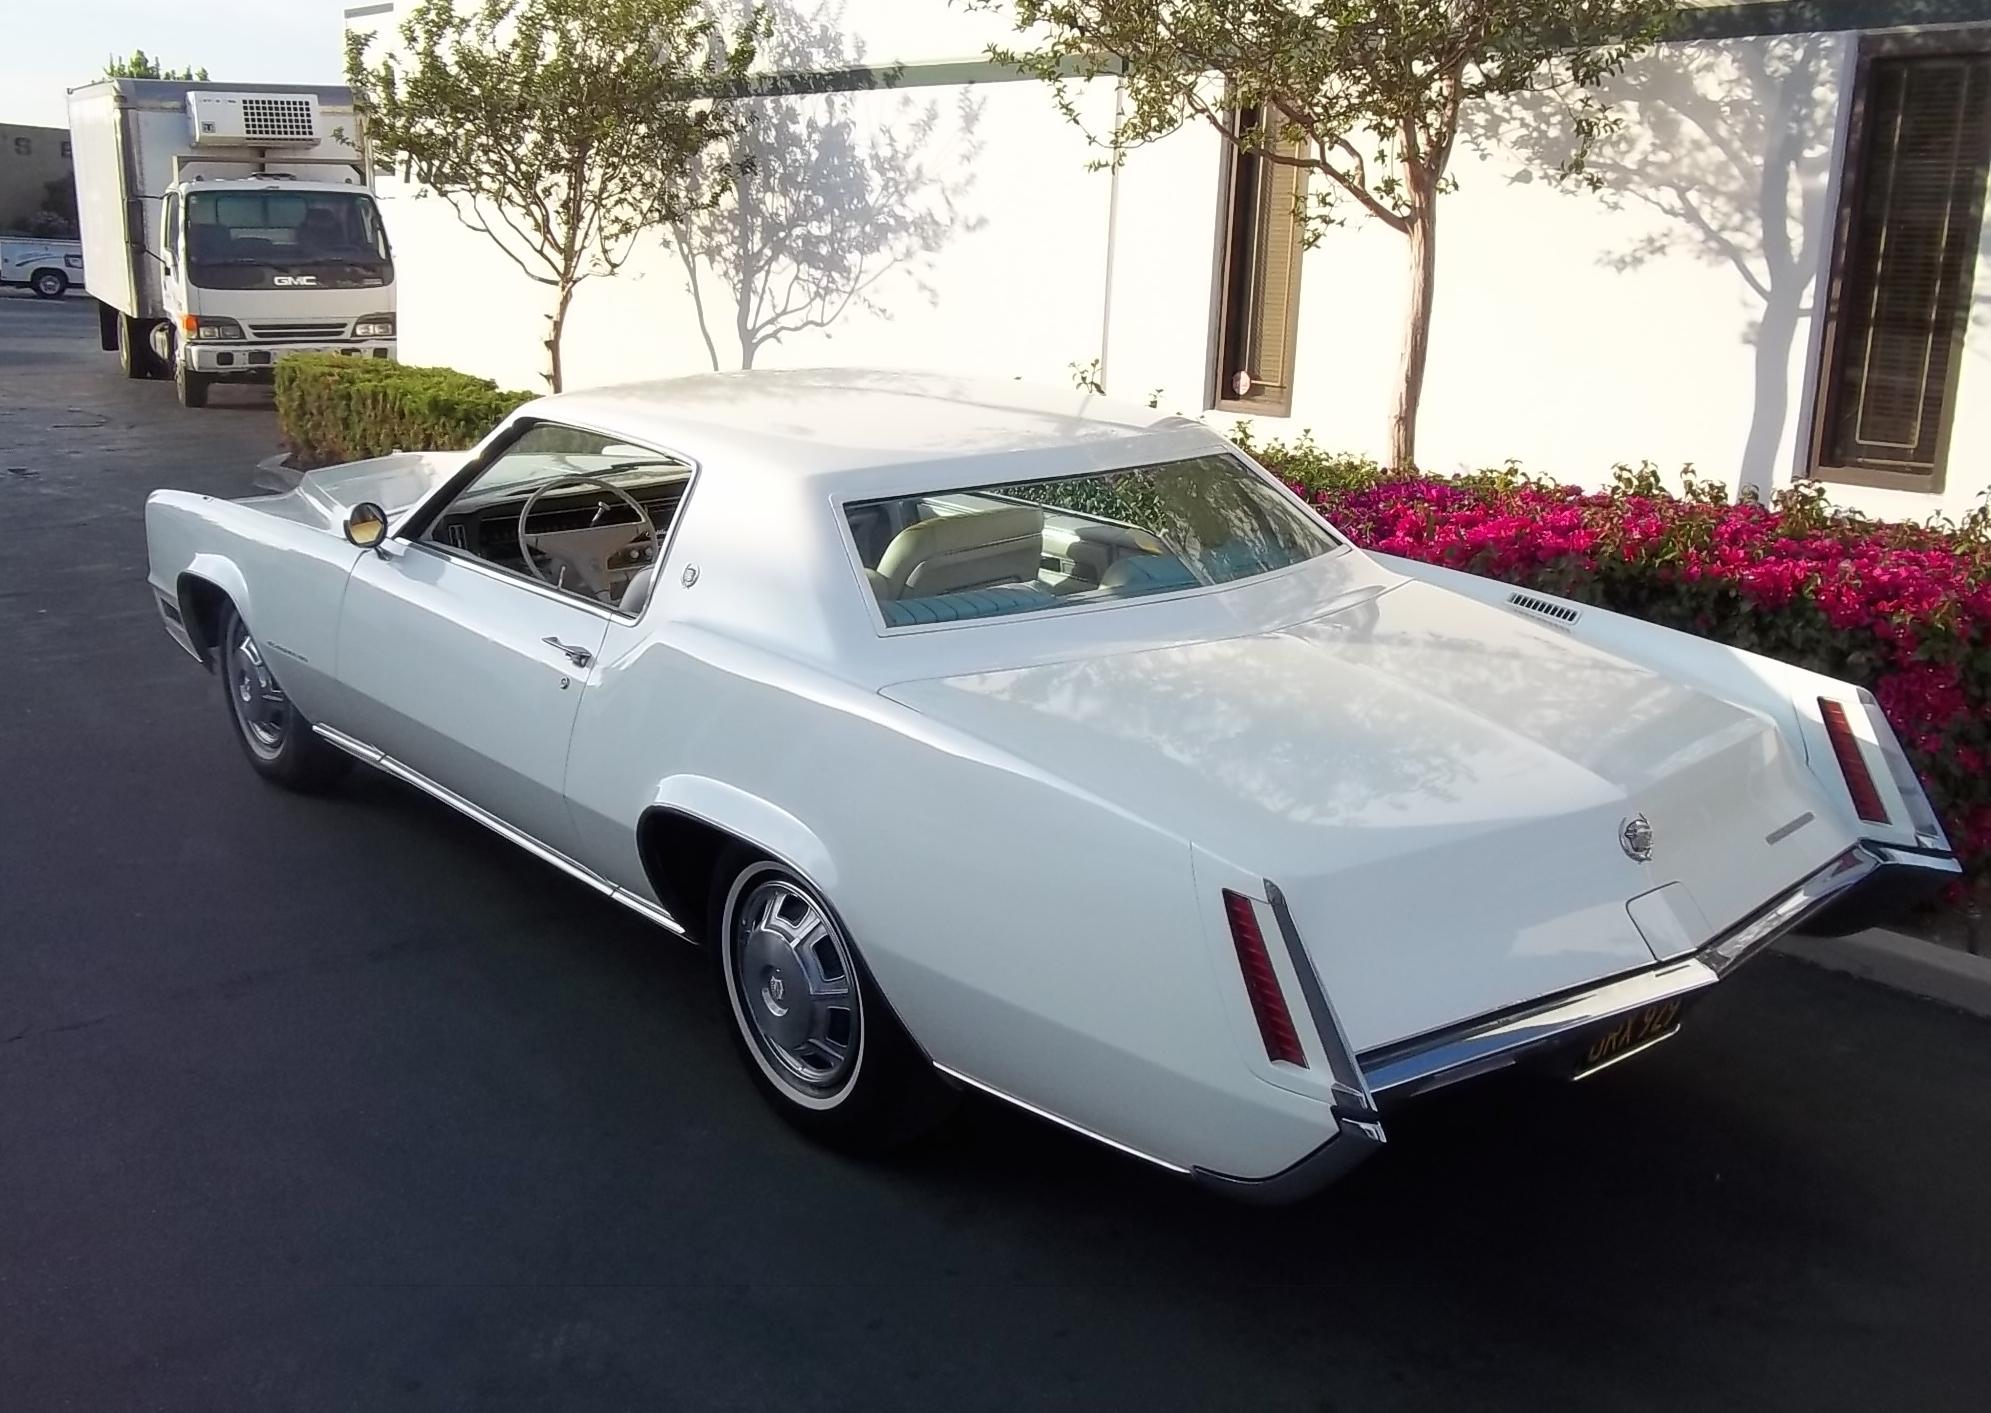 Cadillac Eldorado Driven Co